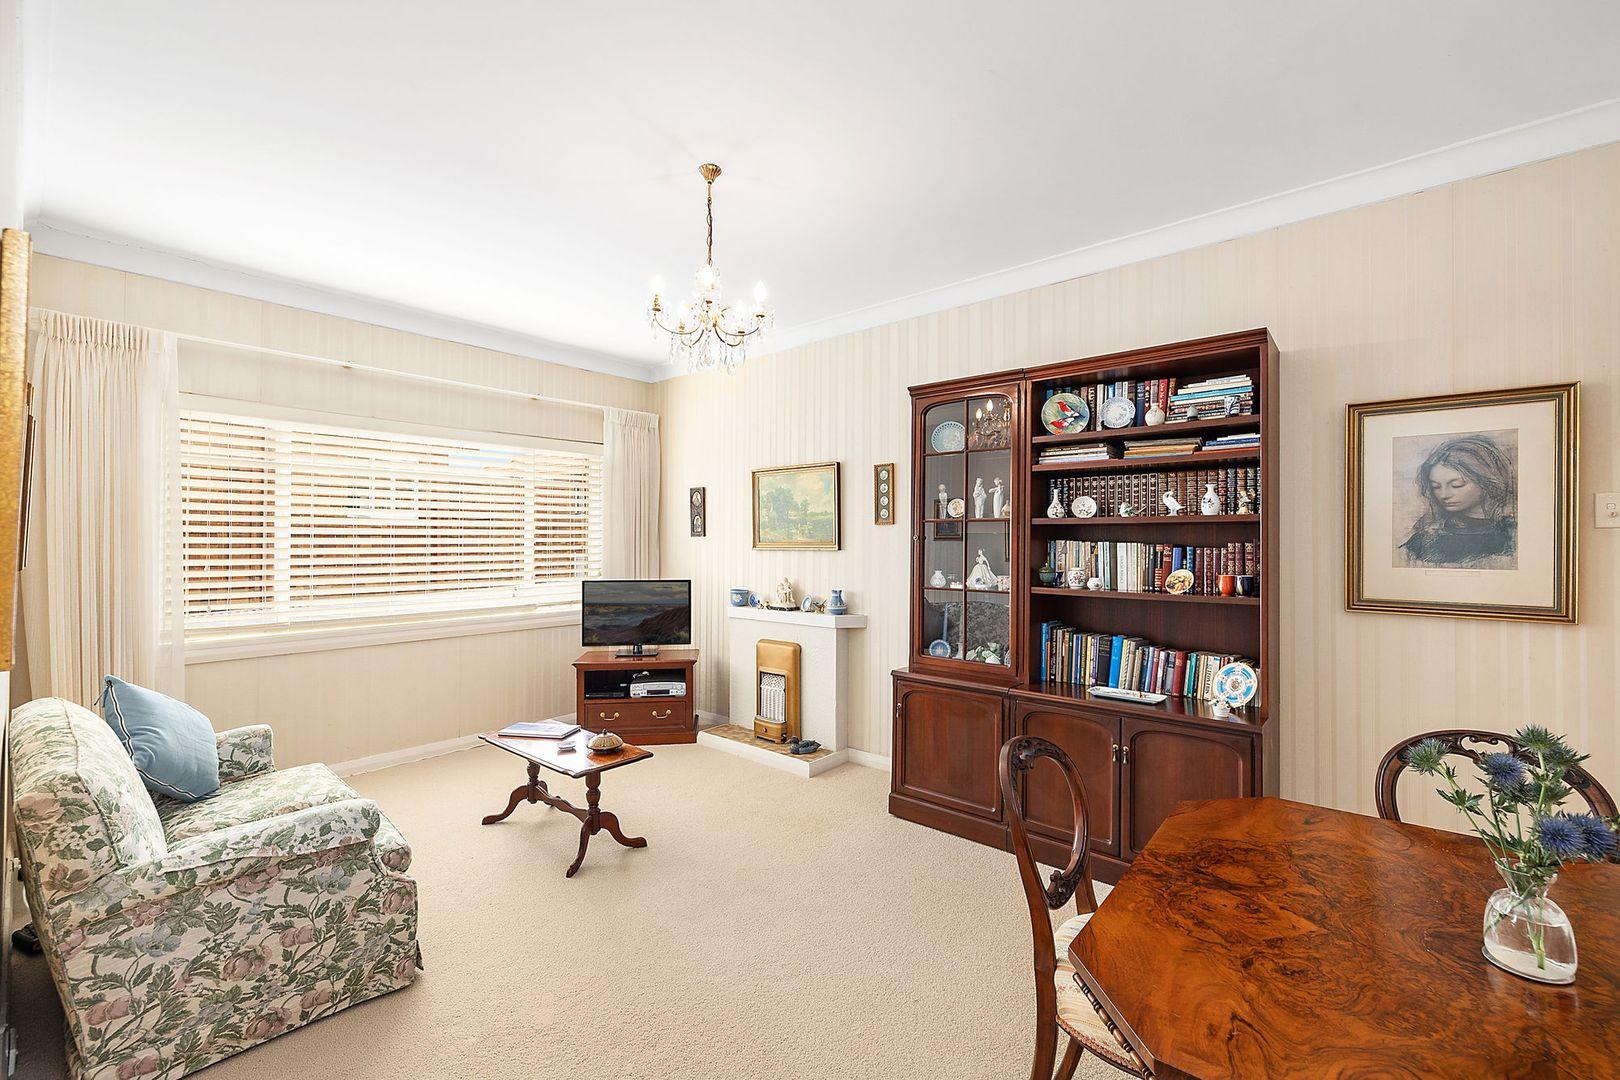 2 bedrooms Apartment / Unit / Flat in 4/60 Raglan  Street MOSMAN NSW, 2088